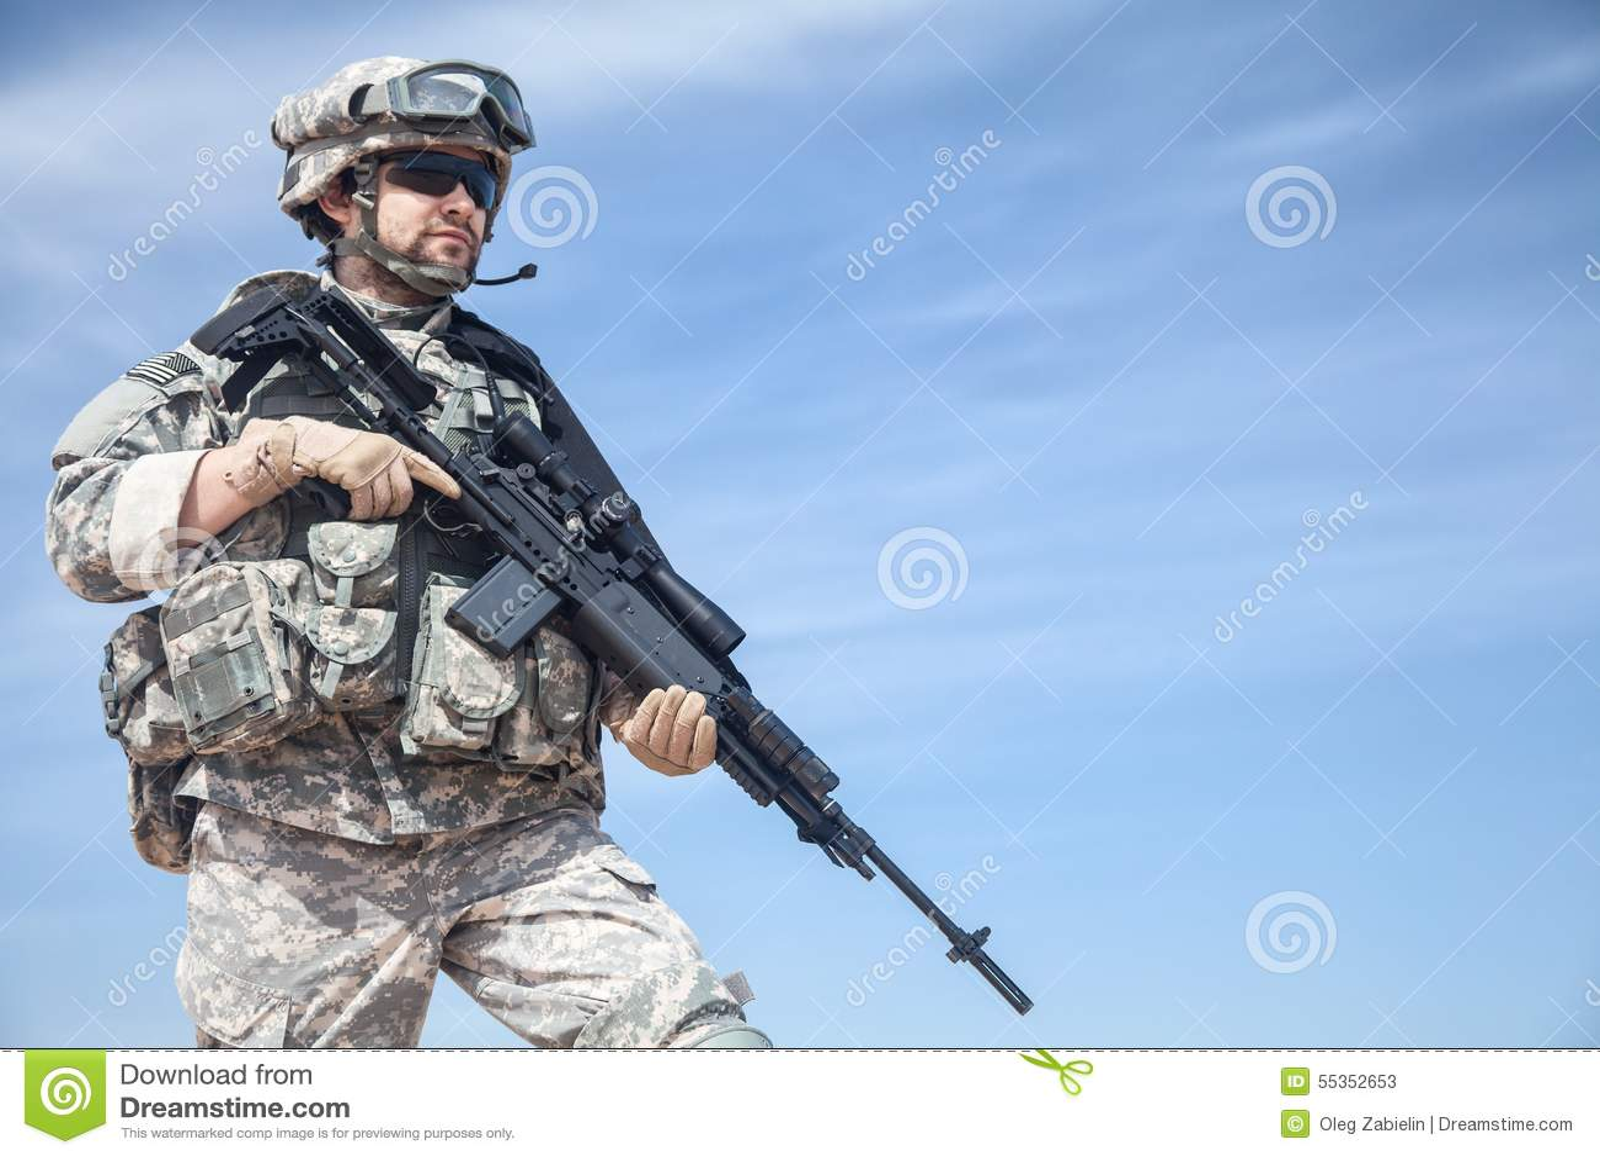 Paracadutista degli Stati Uniti